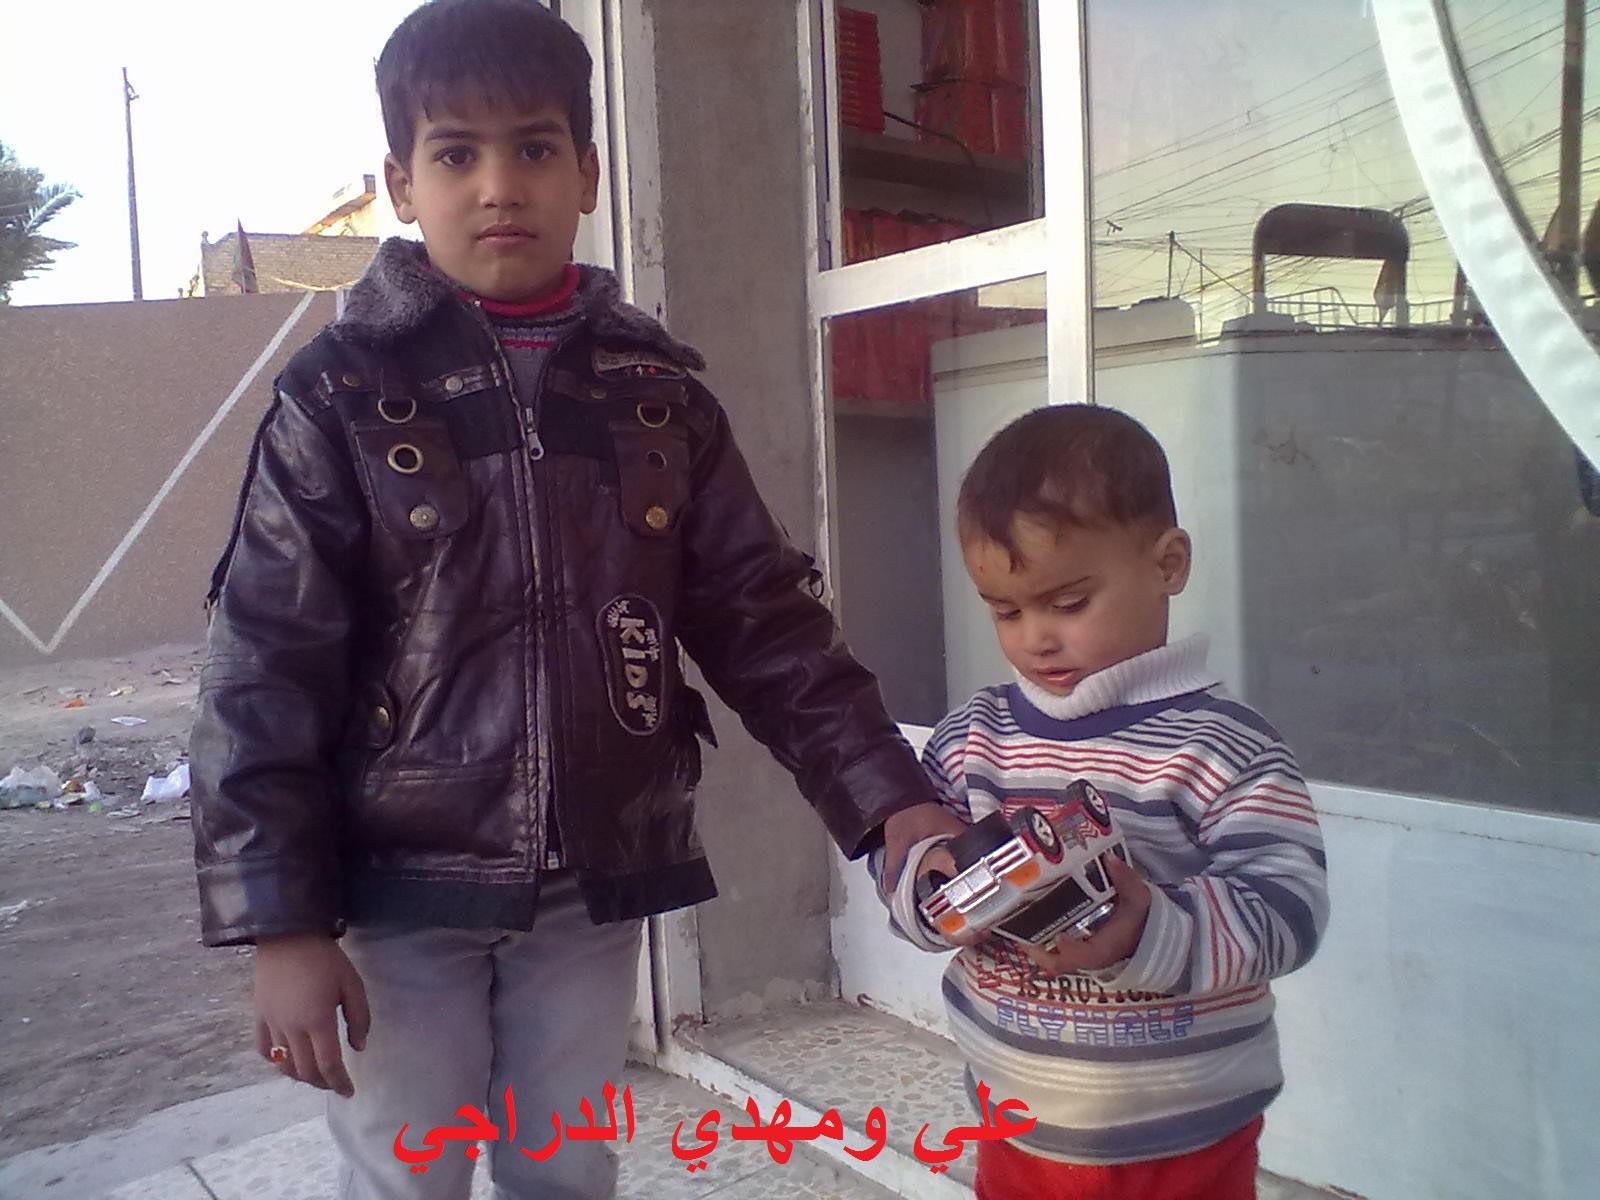 حسين الدراجي اولاد حسين الدراجي 21012060102